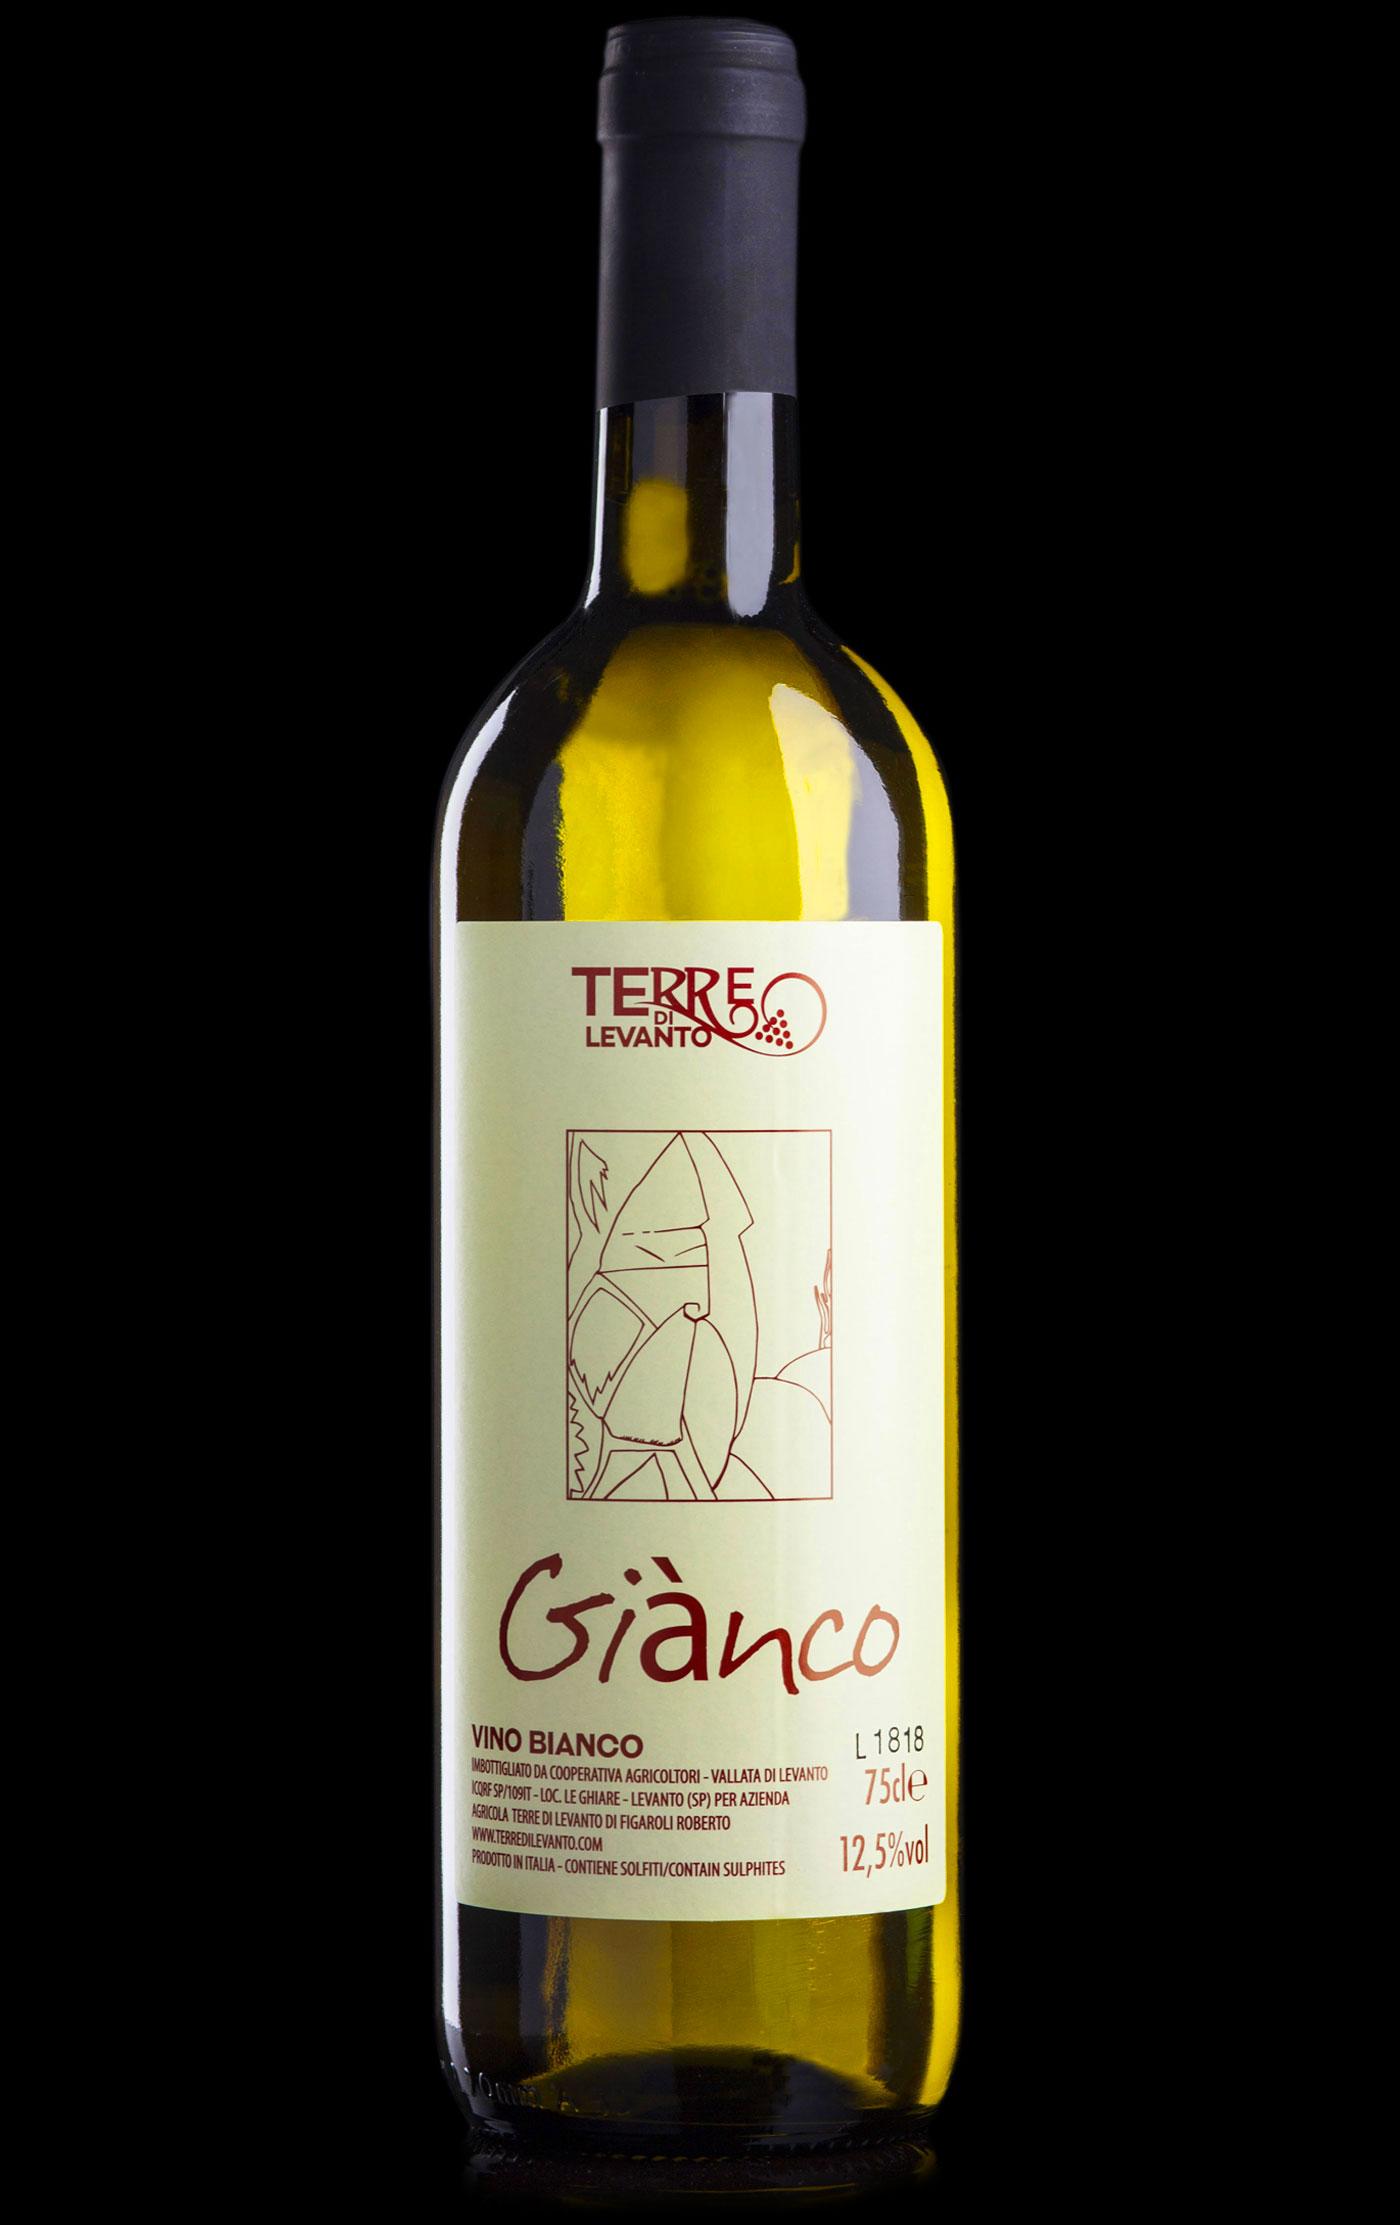 Giànco - Vino bianco da tavola